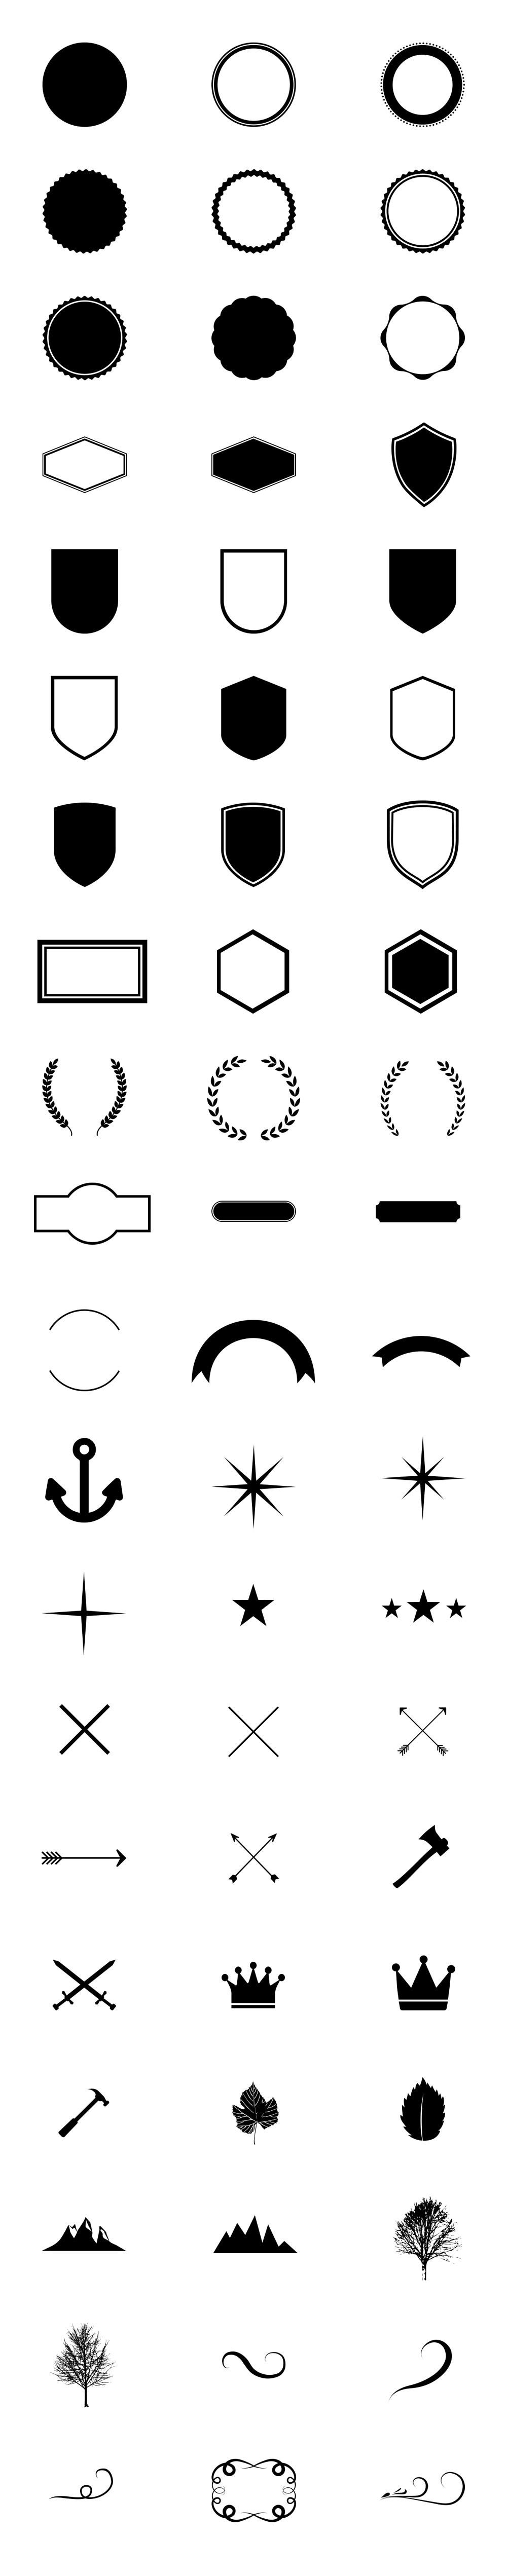 Vectores para crear tu propio logo